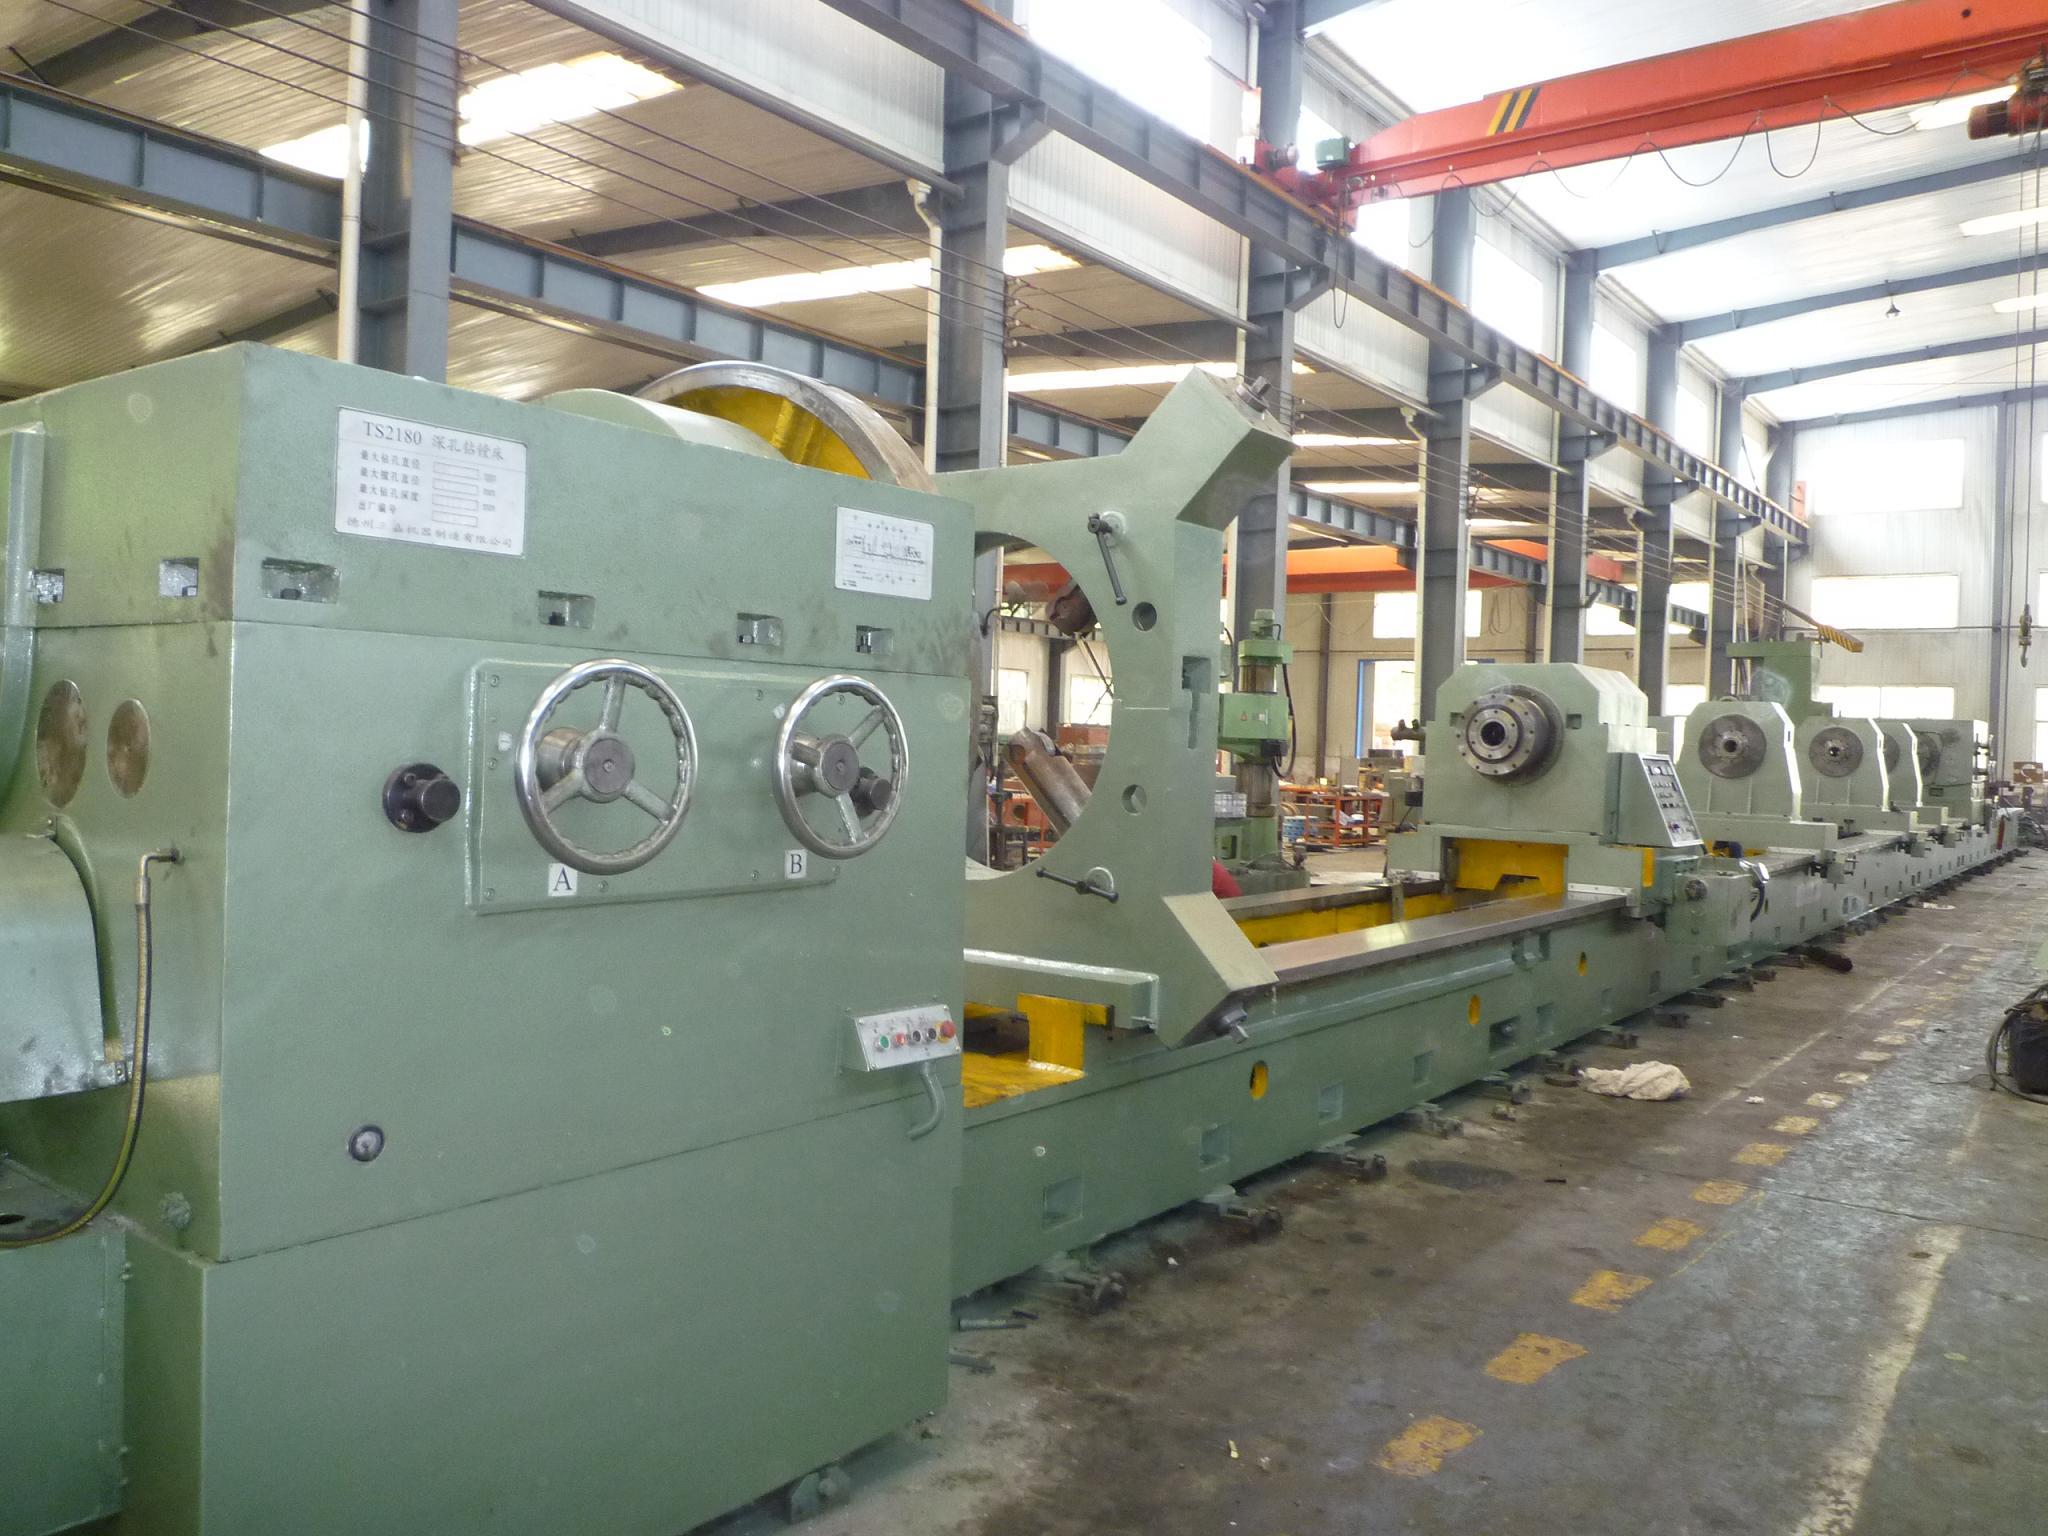 TSQ 2180 CNC deep hole boring machine